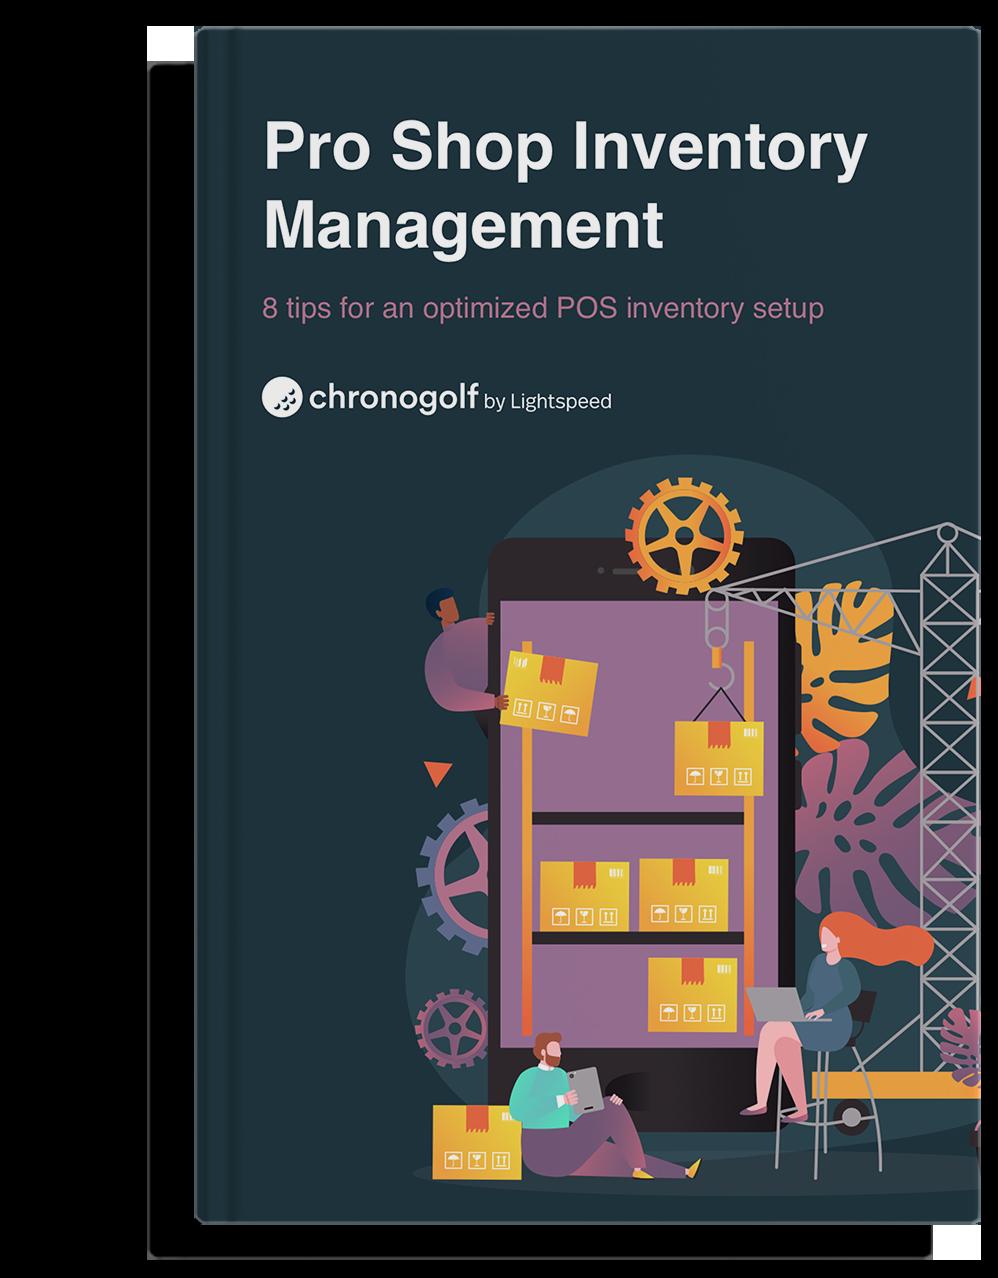 pro-shop-inventory-management-cover